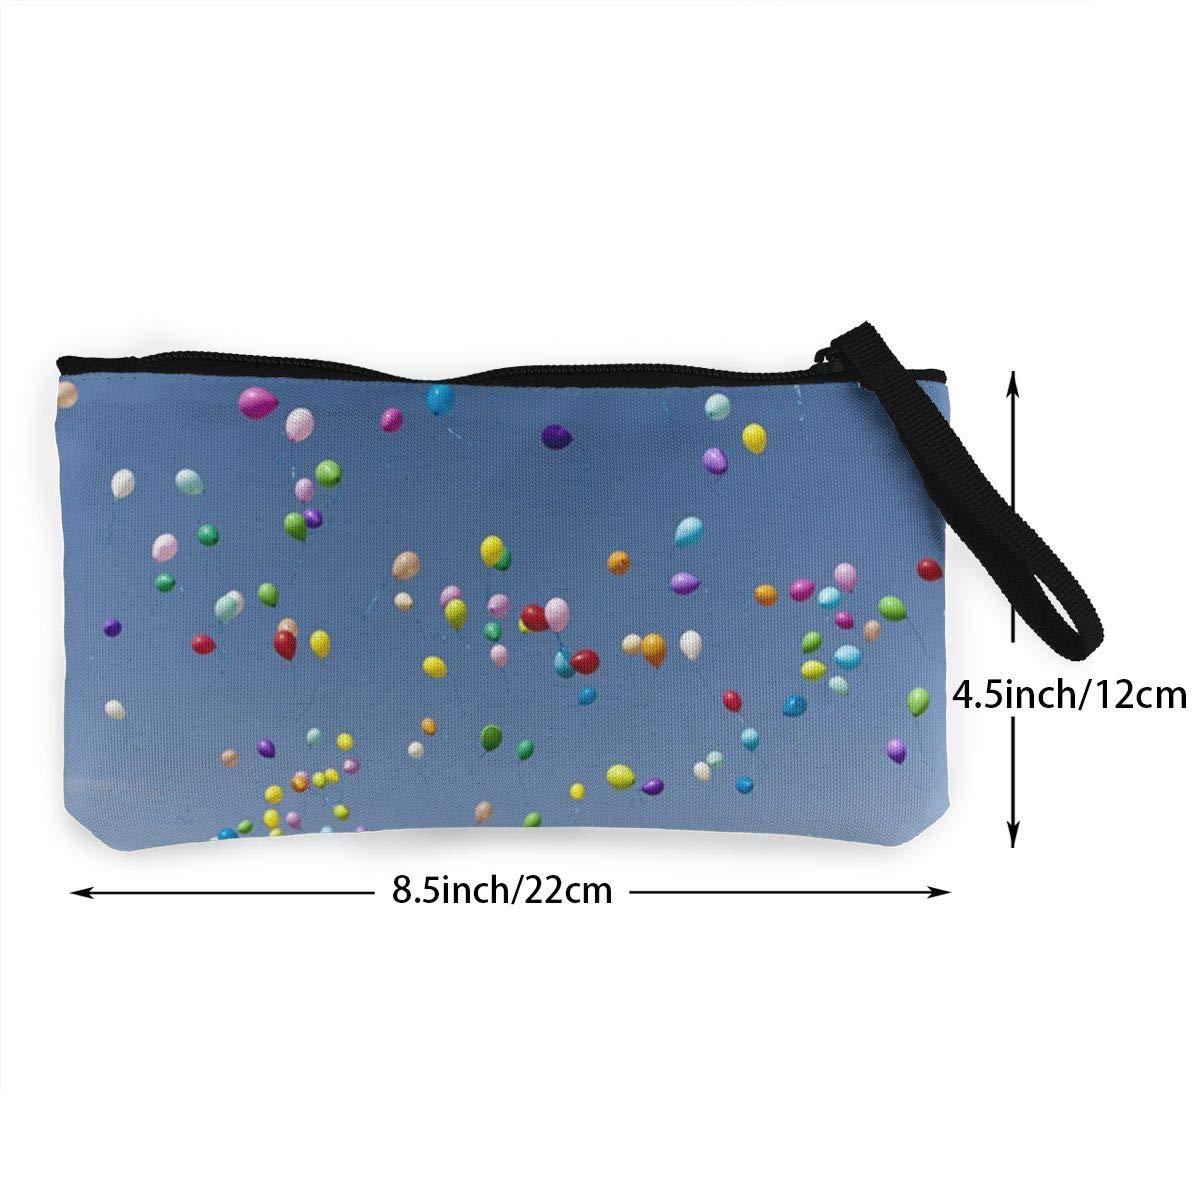 Canvas Cash Coin Purse,Blue Sky Balloon Print Make Up Bag Zipper Small Purse Wallets